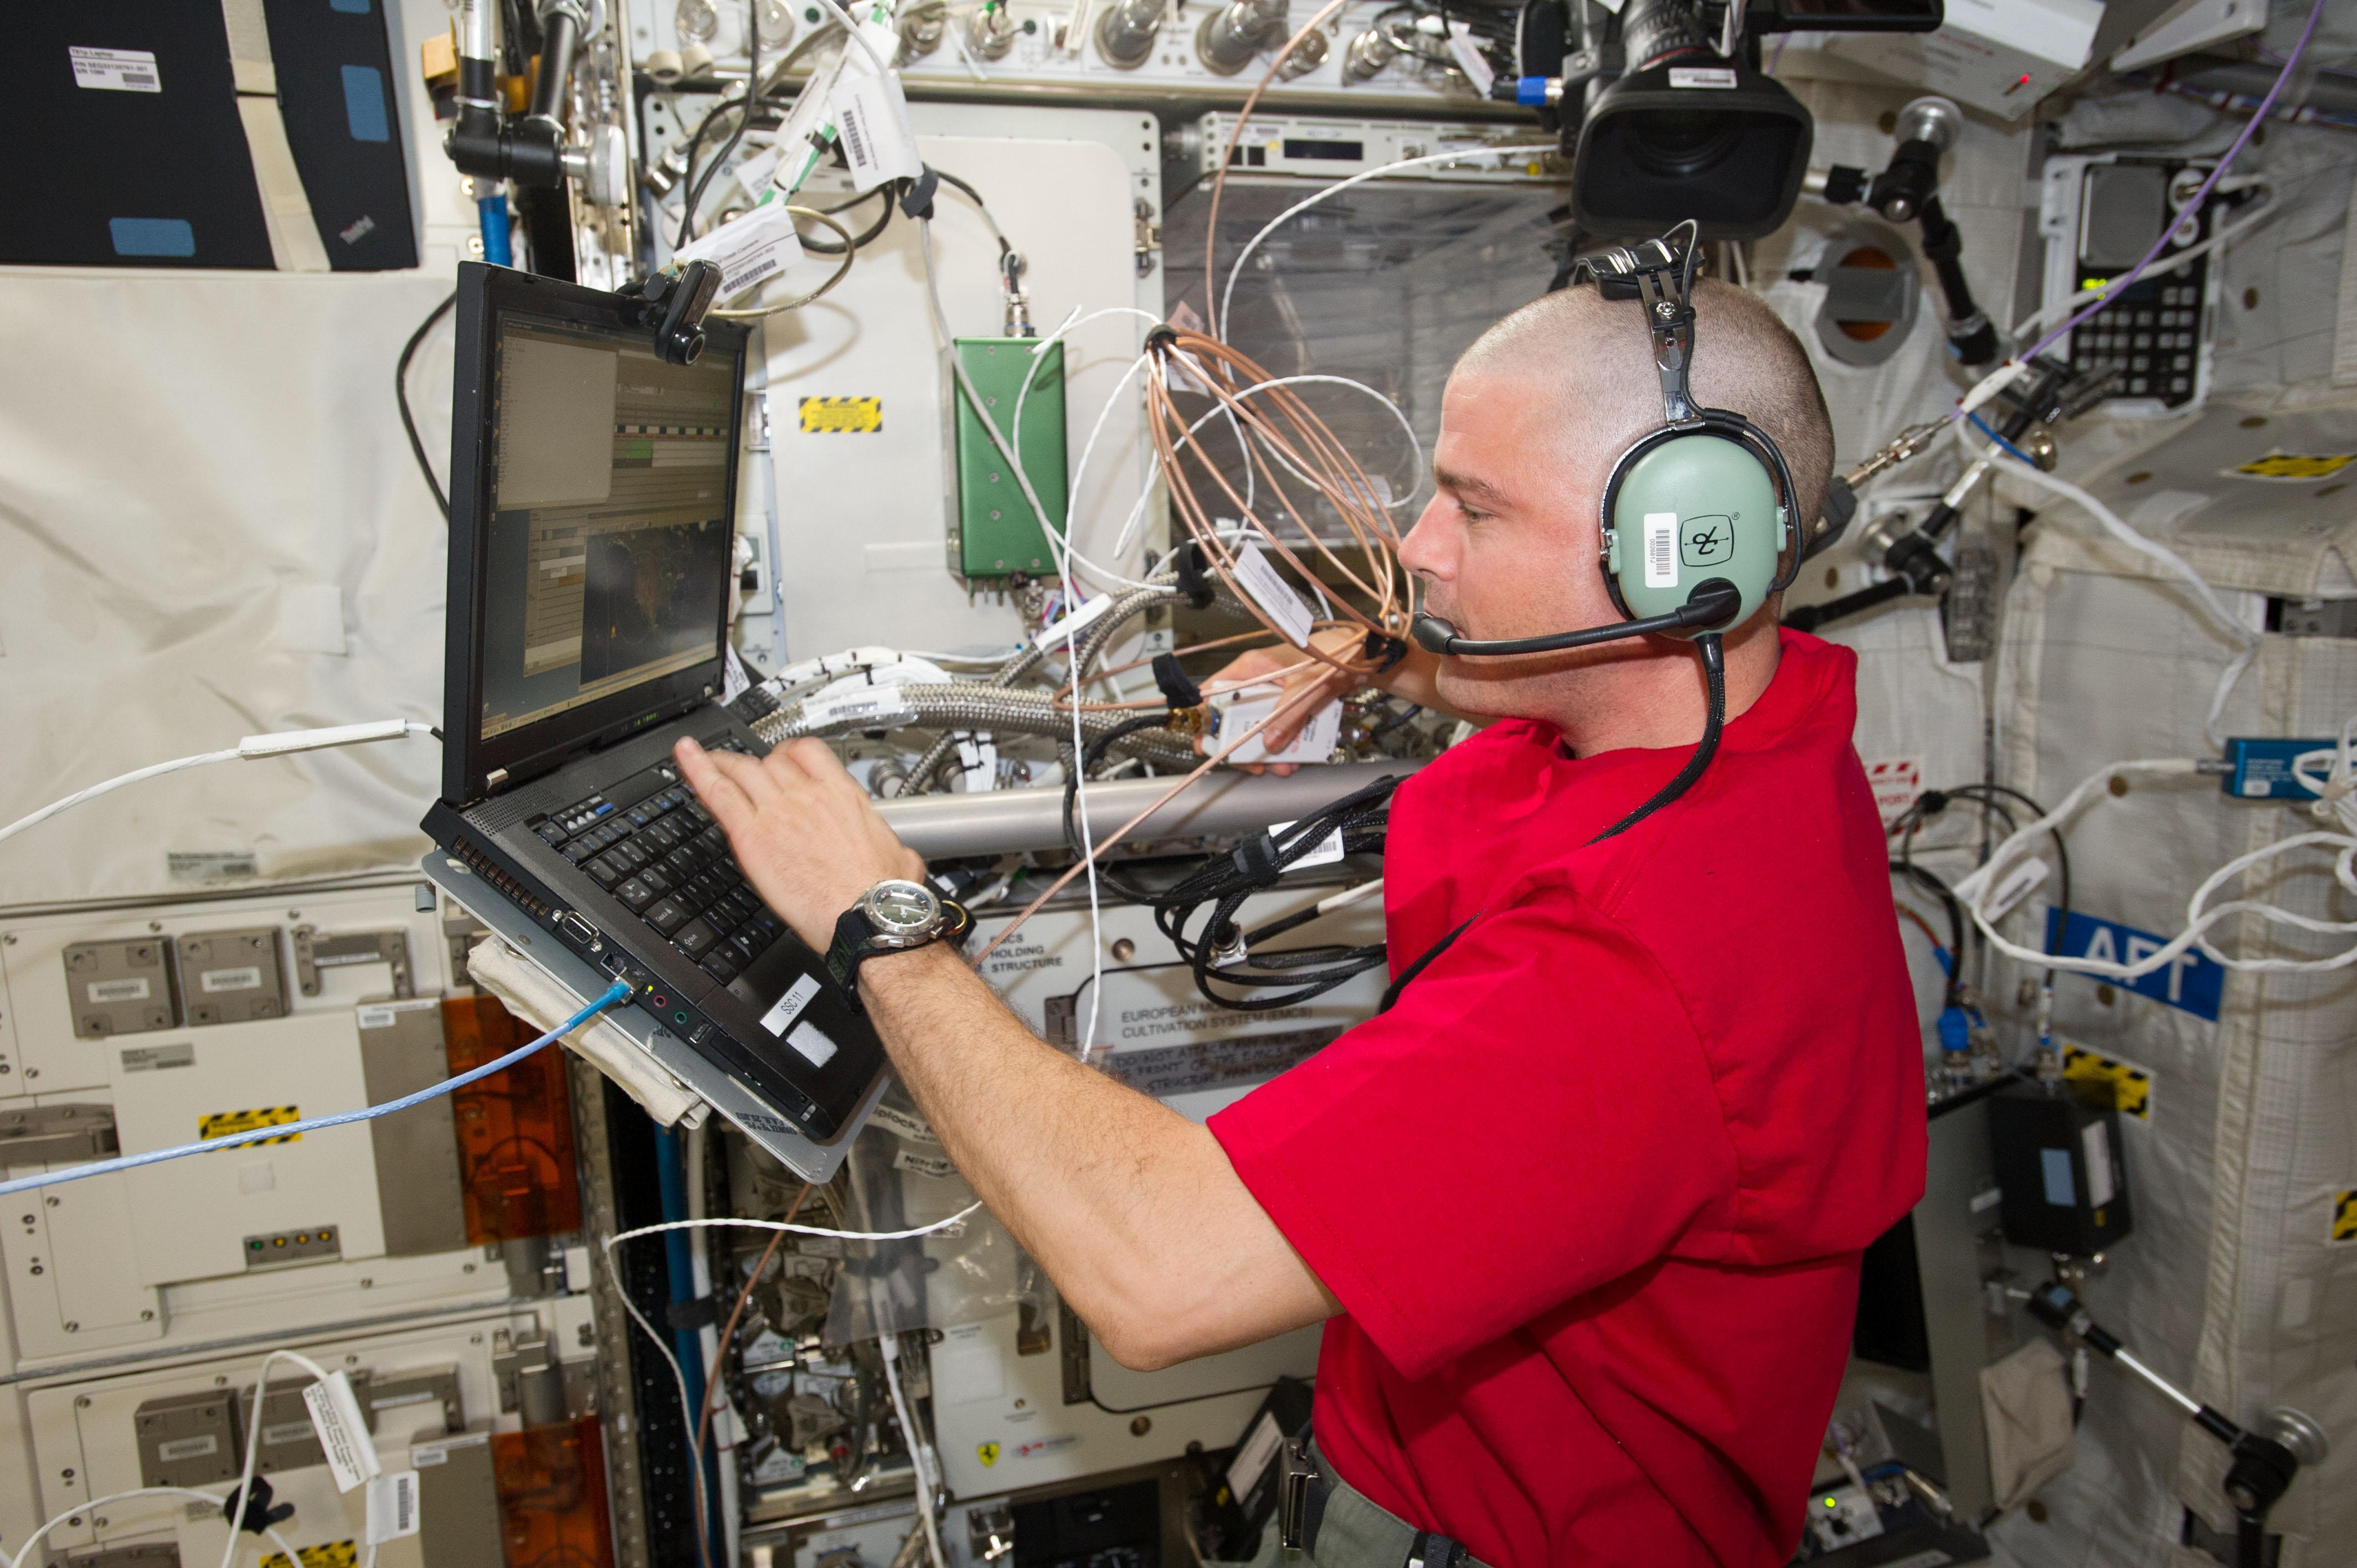 NASA - International Space Station Ham Radio (also known as